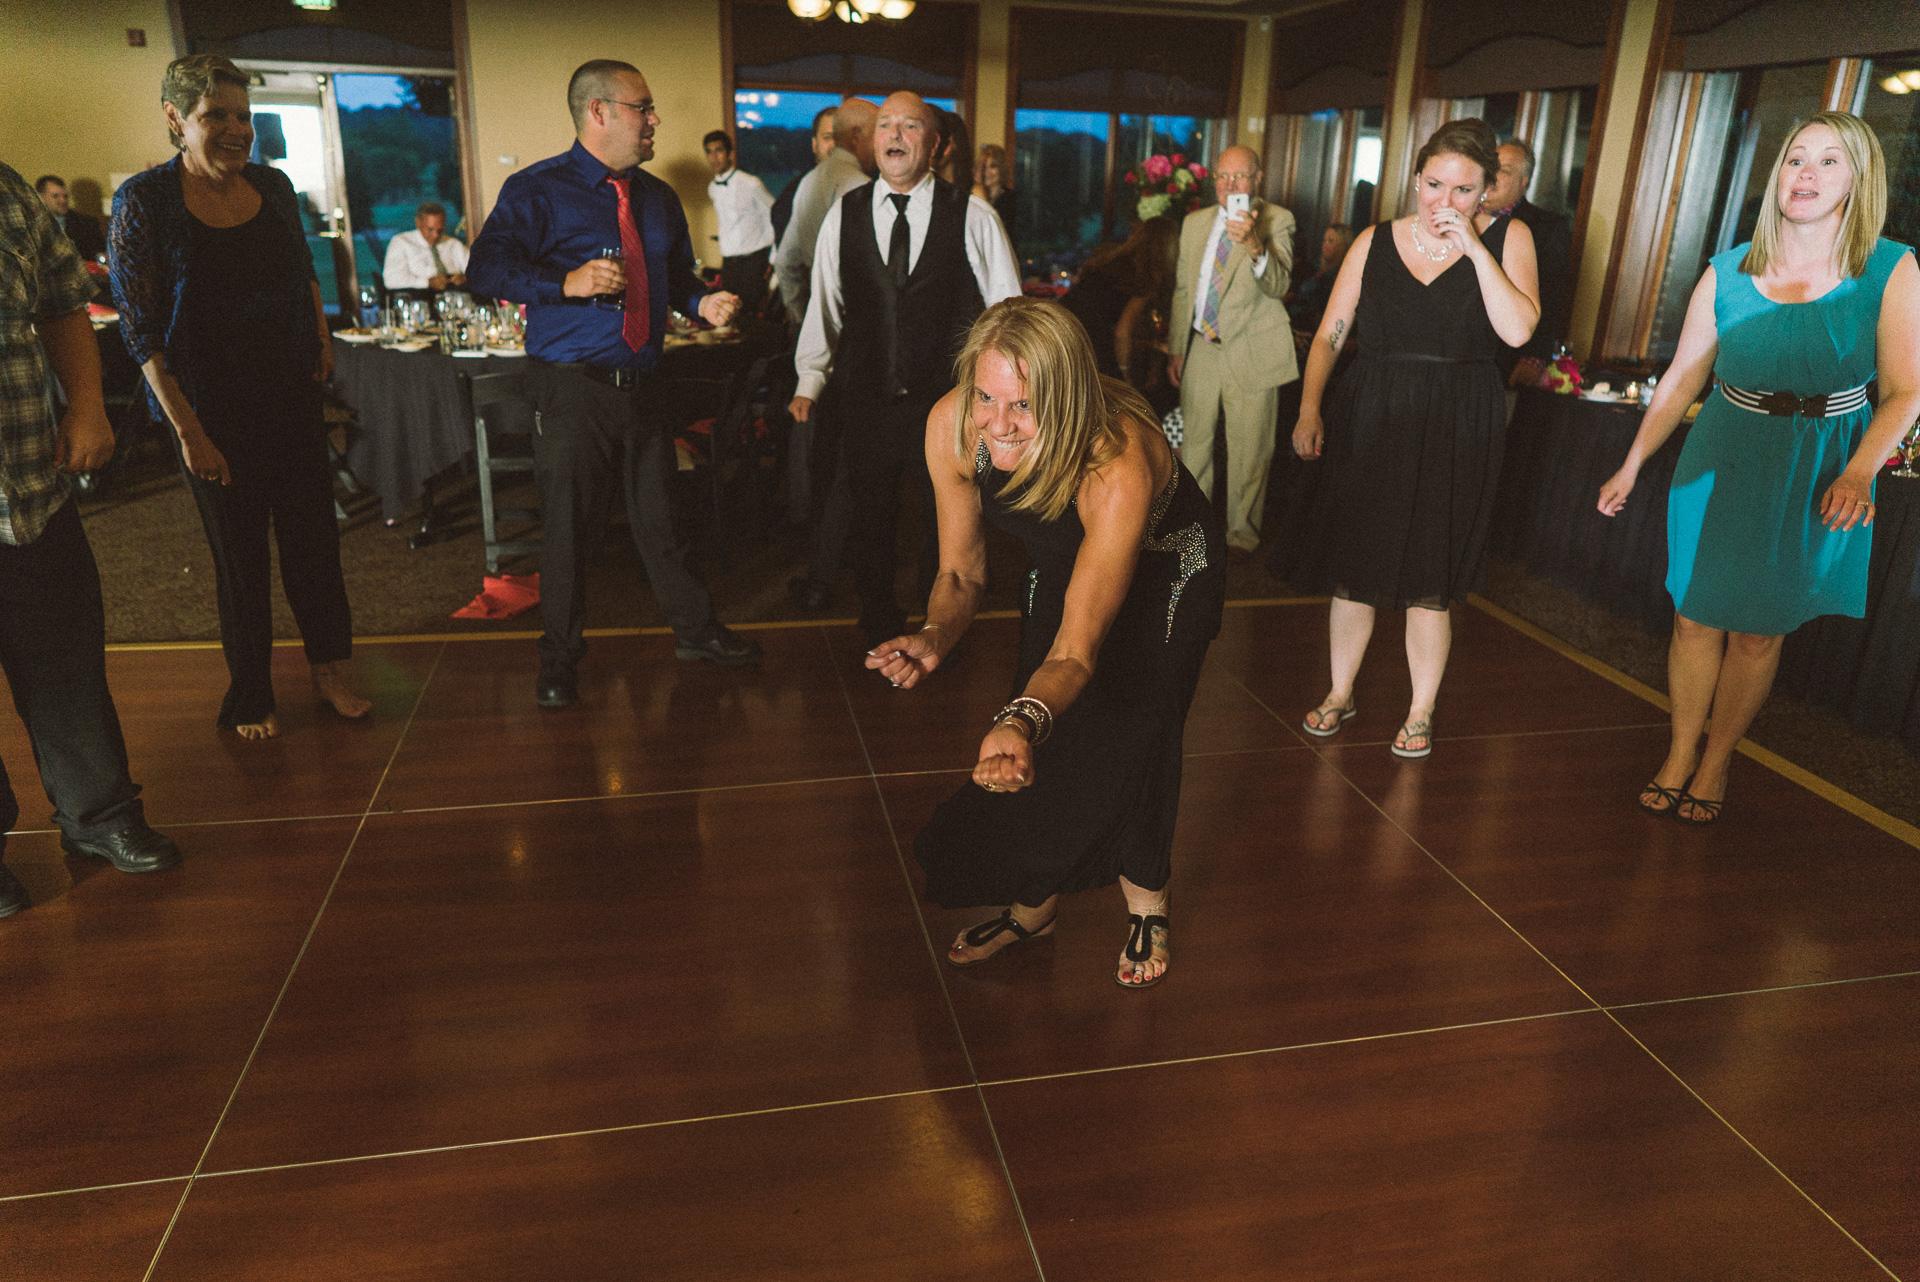 Dayton Wedding Photographer - Mother of the Groom